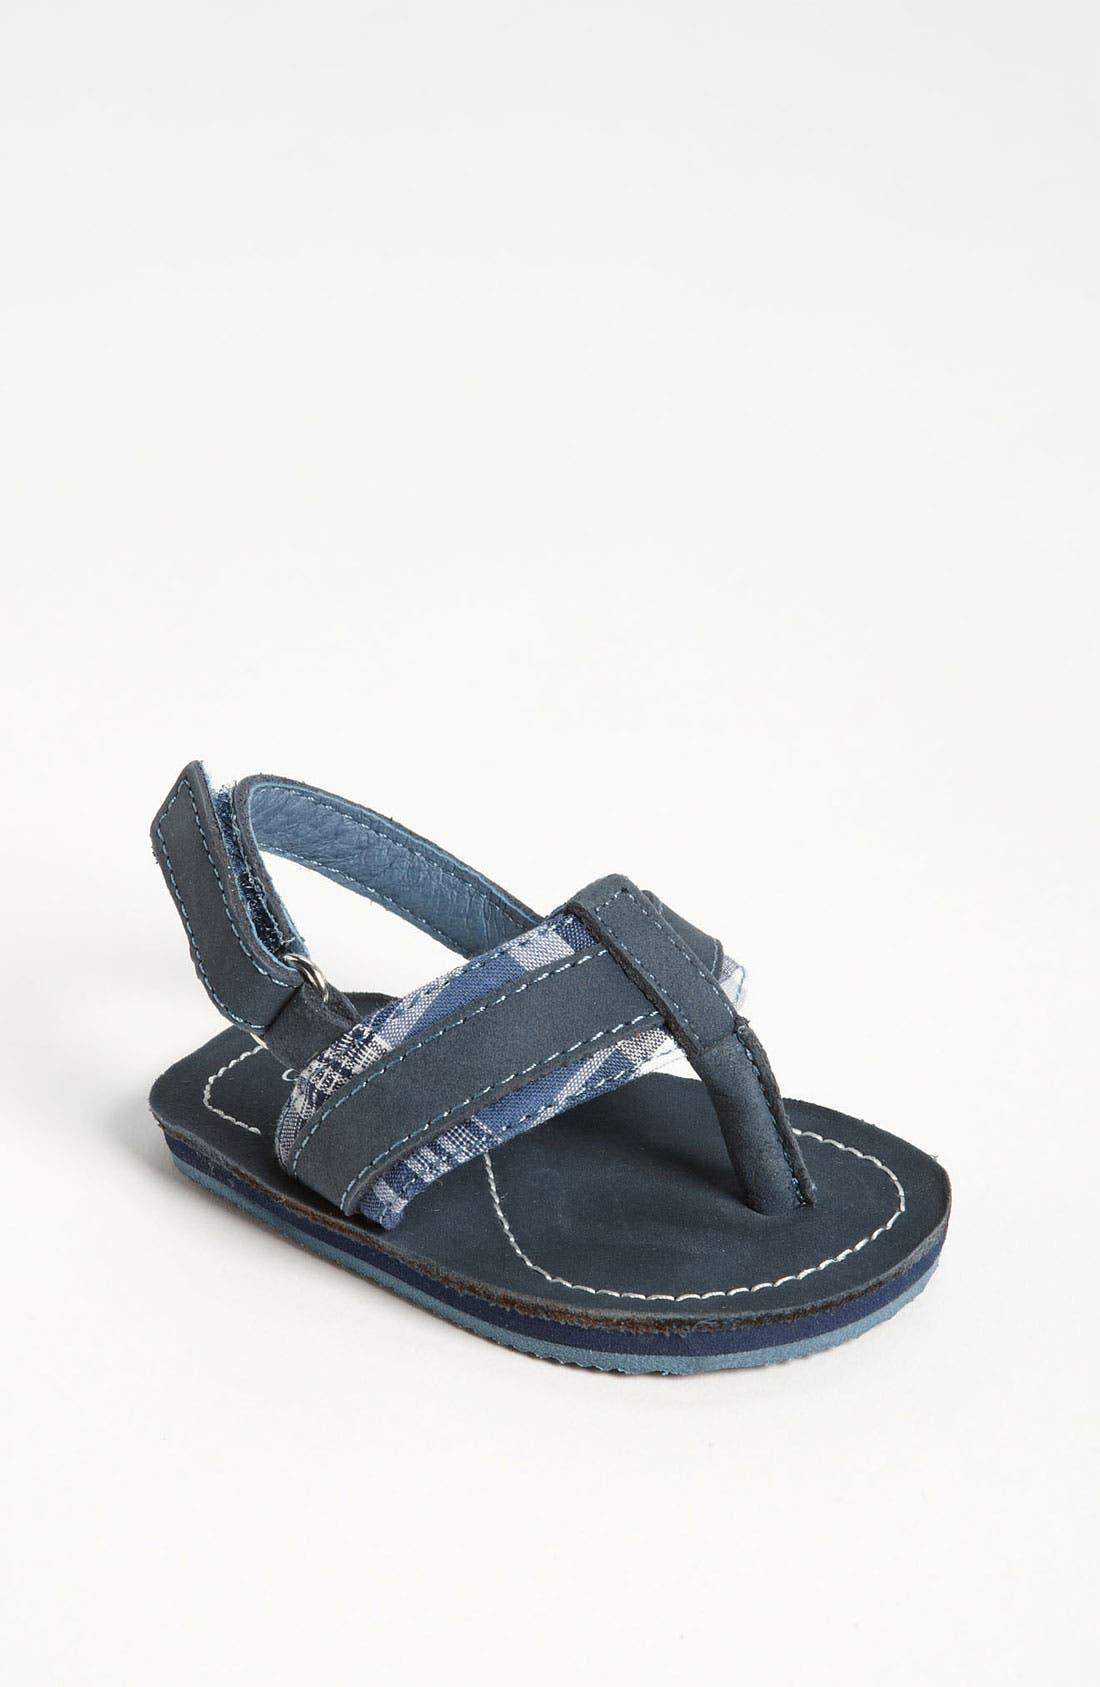 Main Image - Cole Haan 'Mini Felipe' Sandal (Baby)